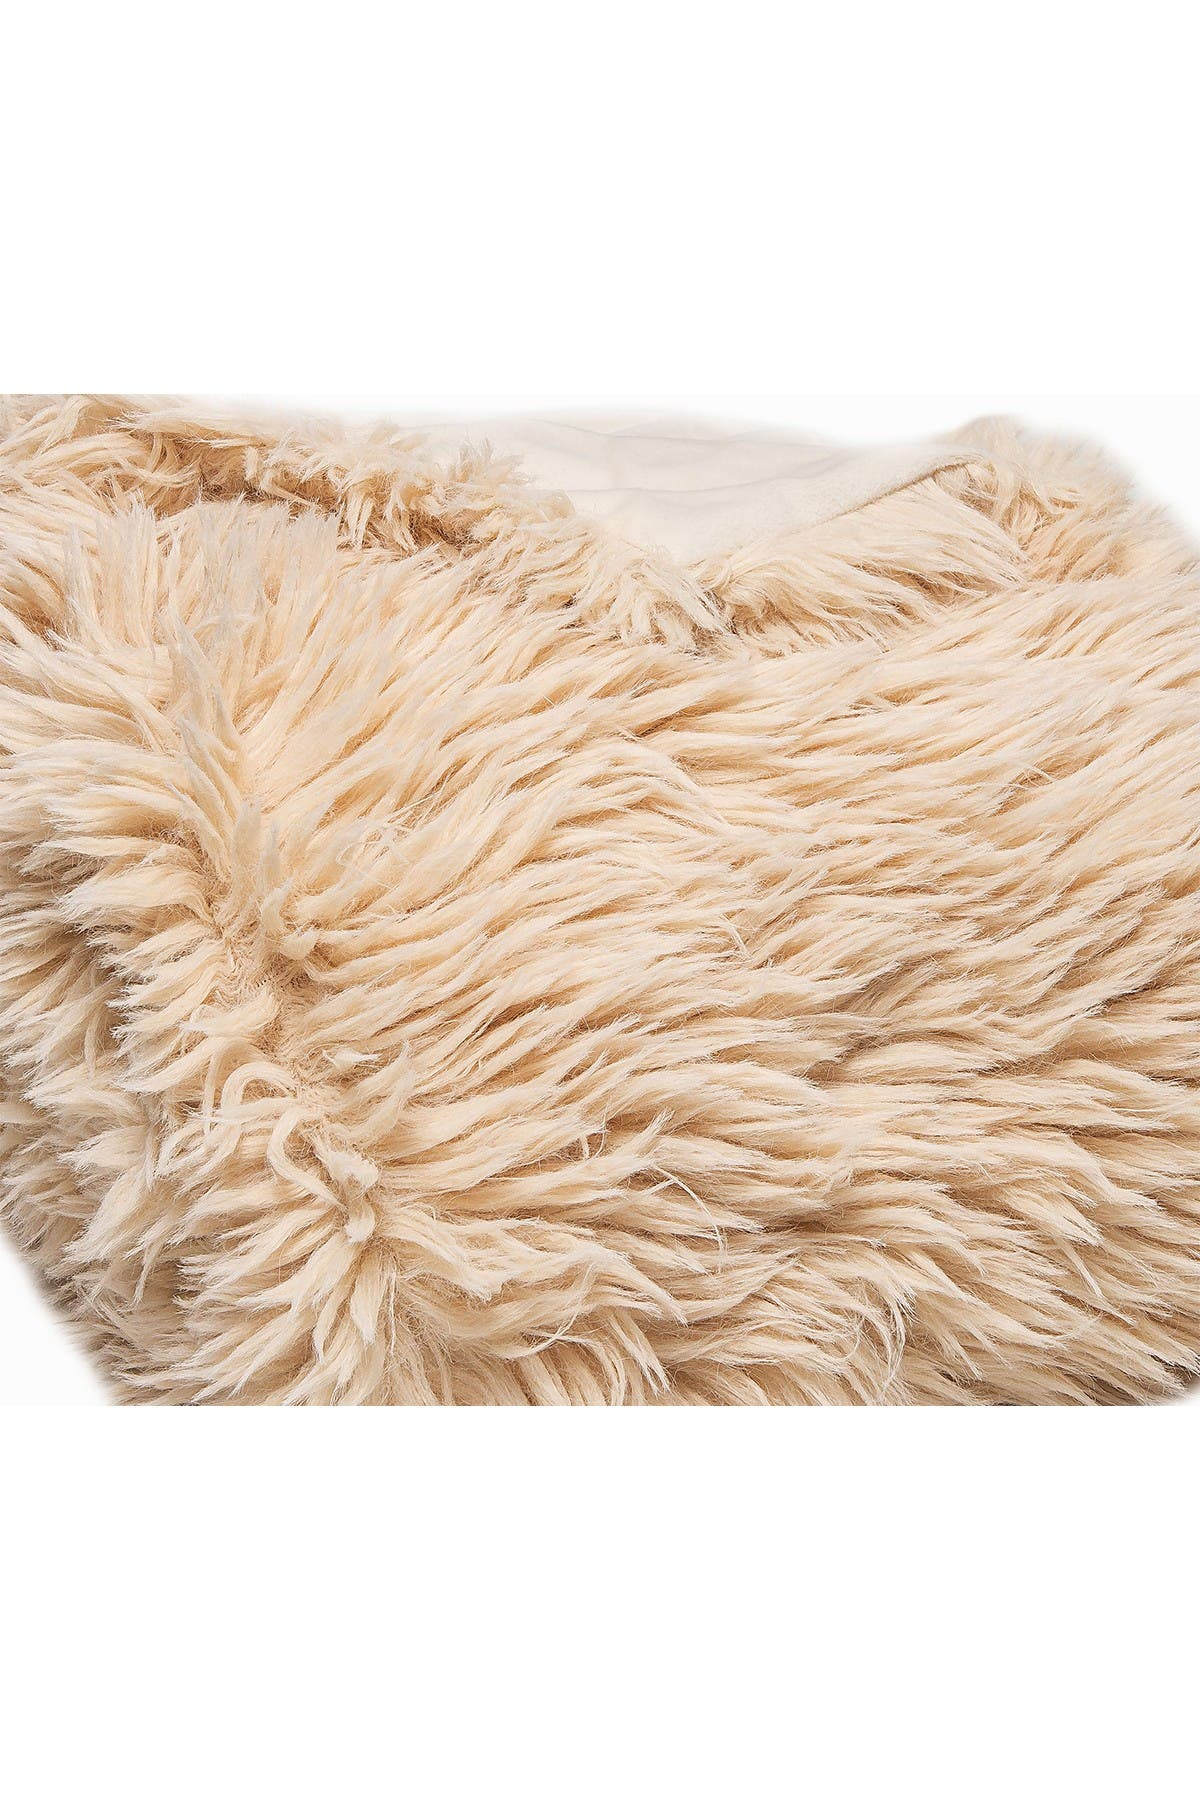 "Image of LUXE Faux Fur Throw - 50"" x 60"" - Tibetan"